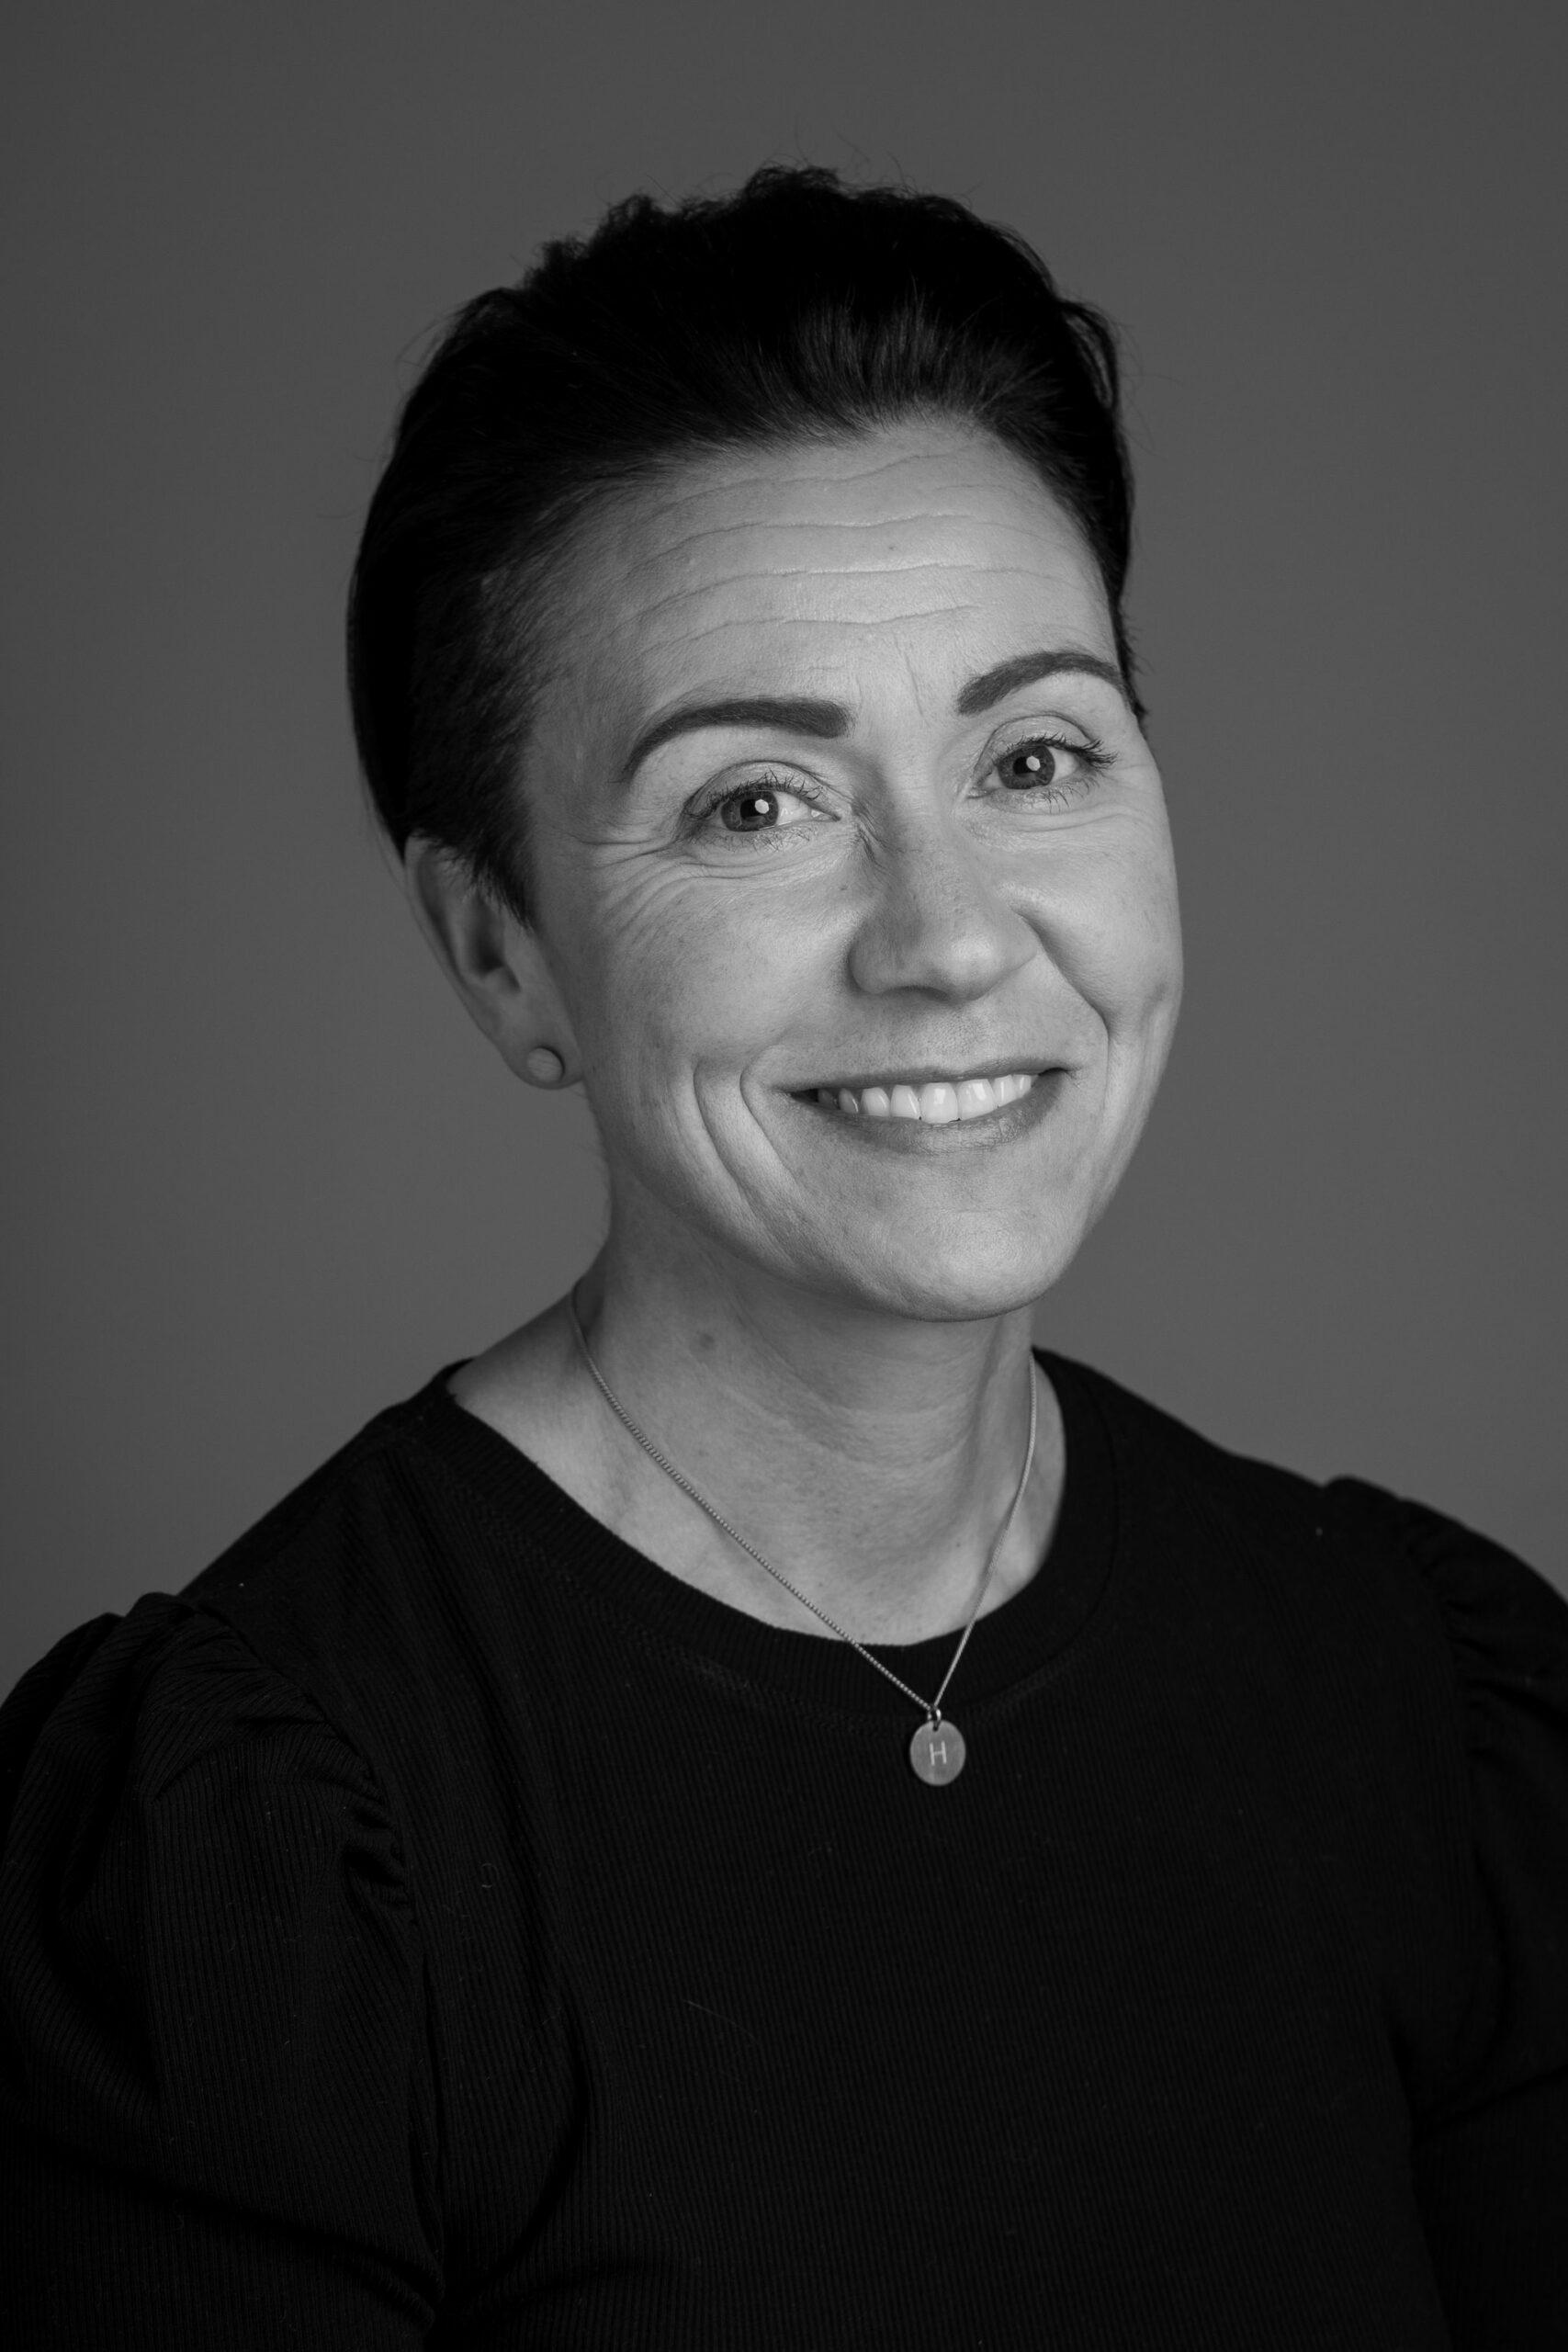 Helena Ólafsdóttir